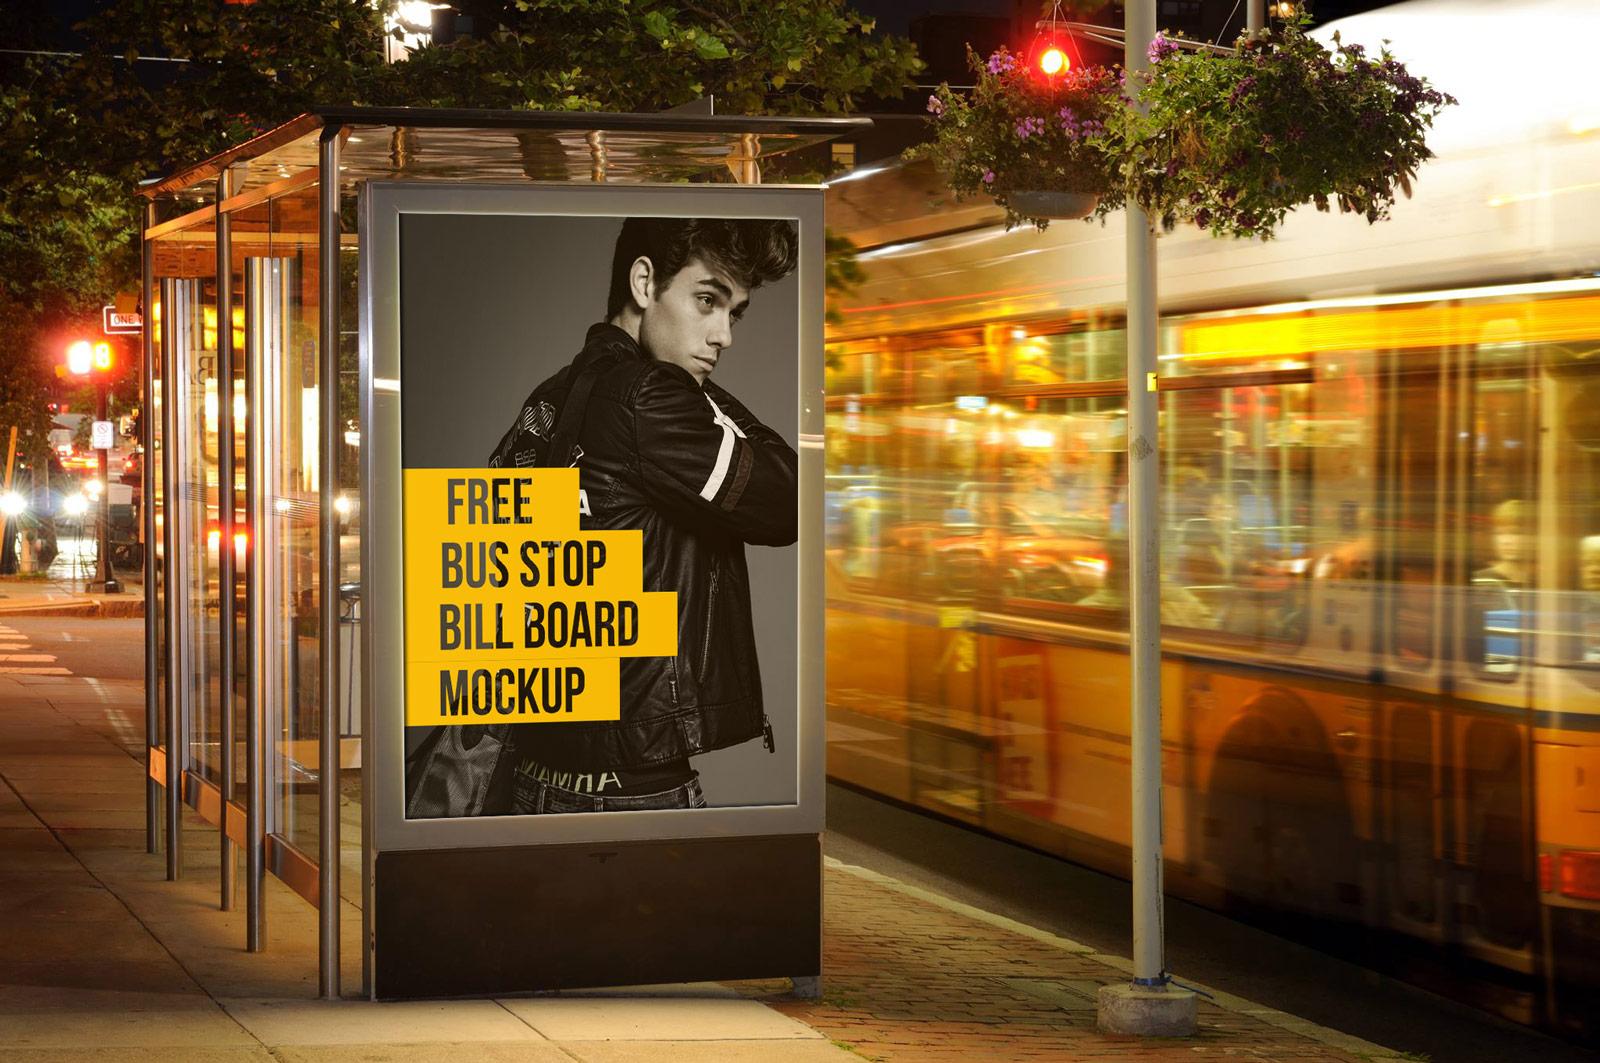 Free-Outdoor-Advertising-Bus-Stop-Billboard-Mockup-PSD